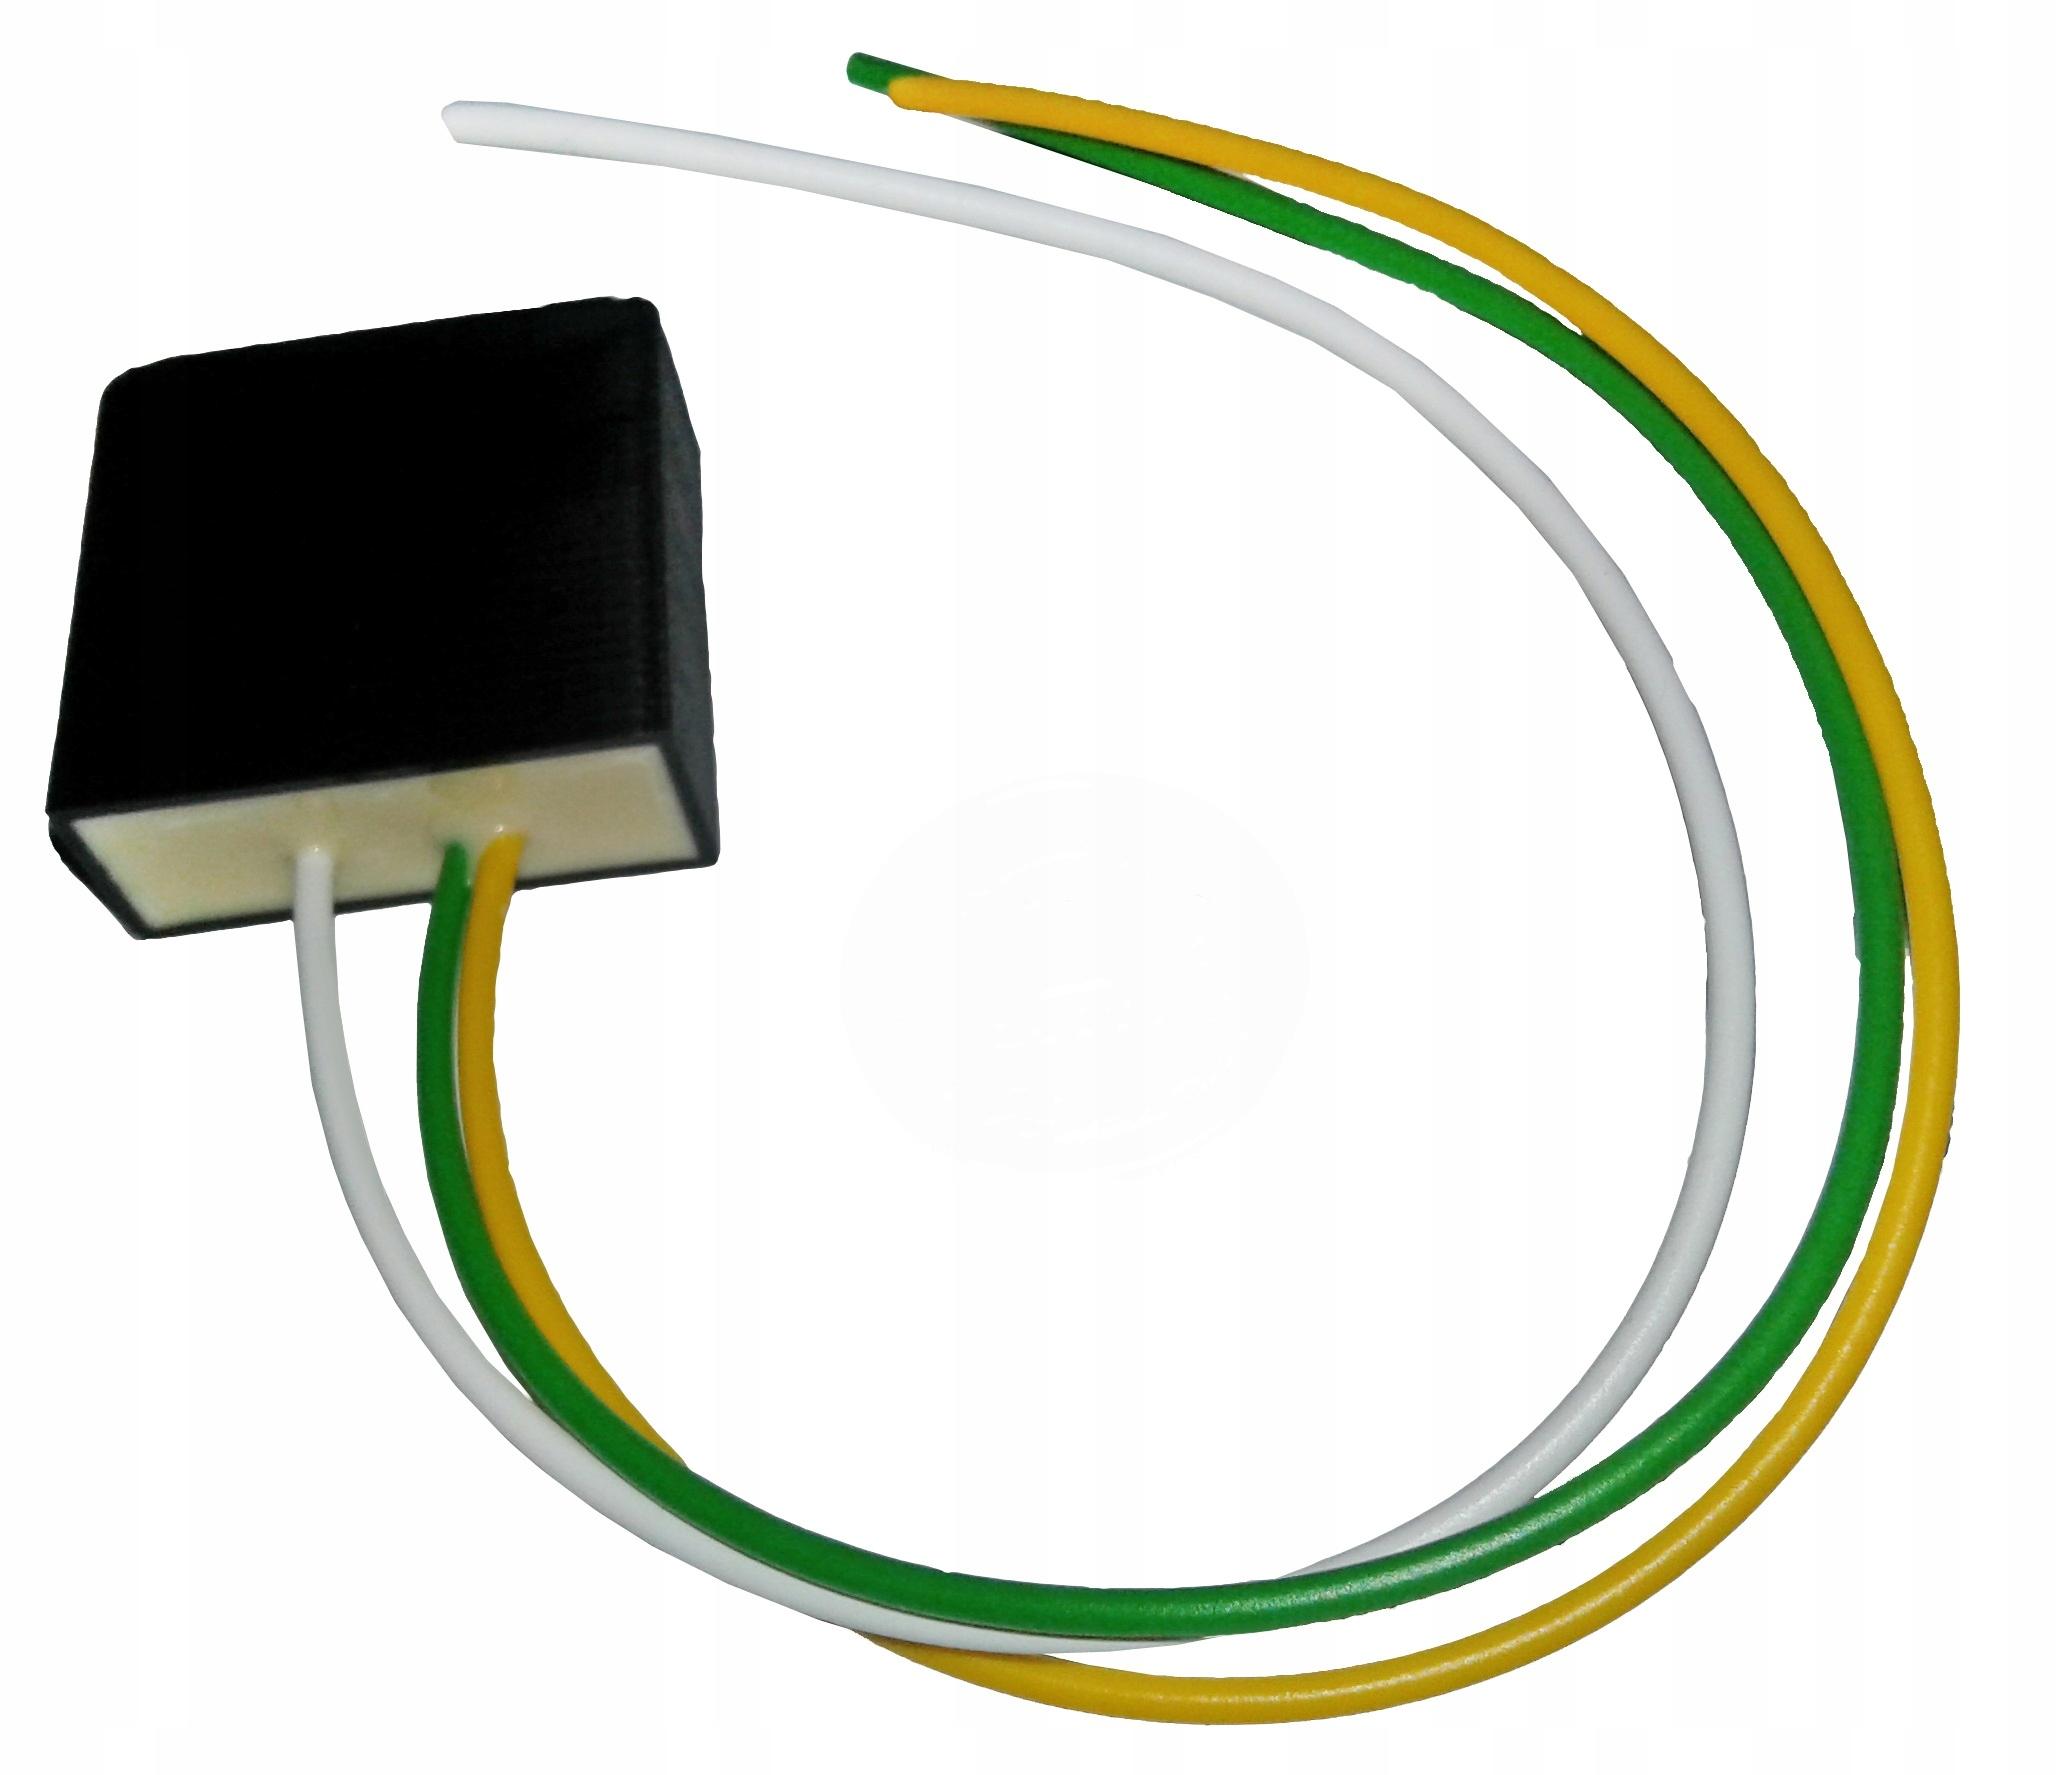 эмулятор другой зонда катализатора к автомобиля toyota